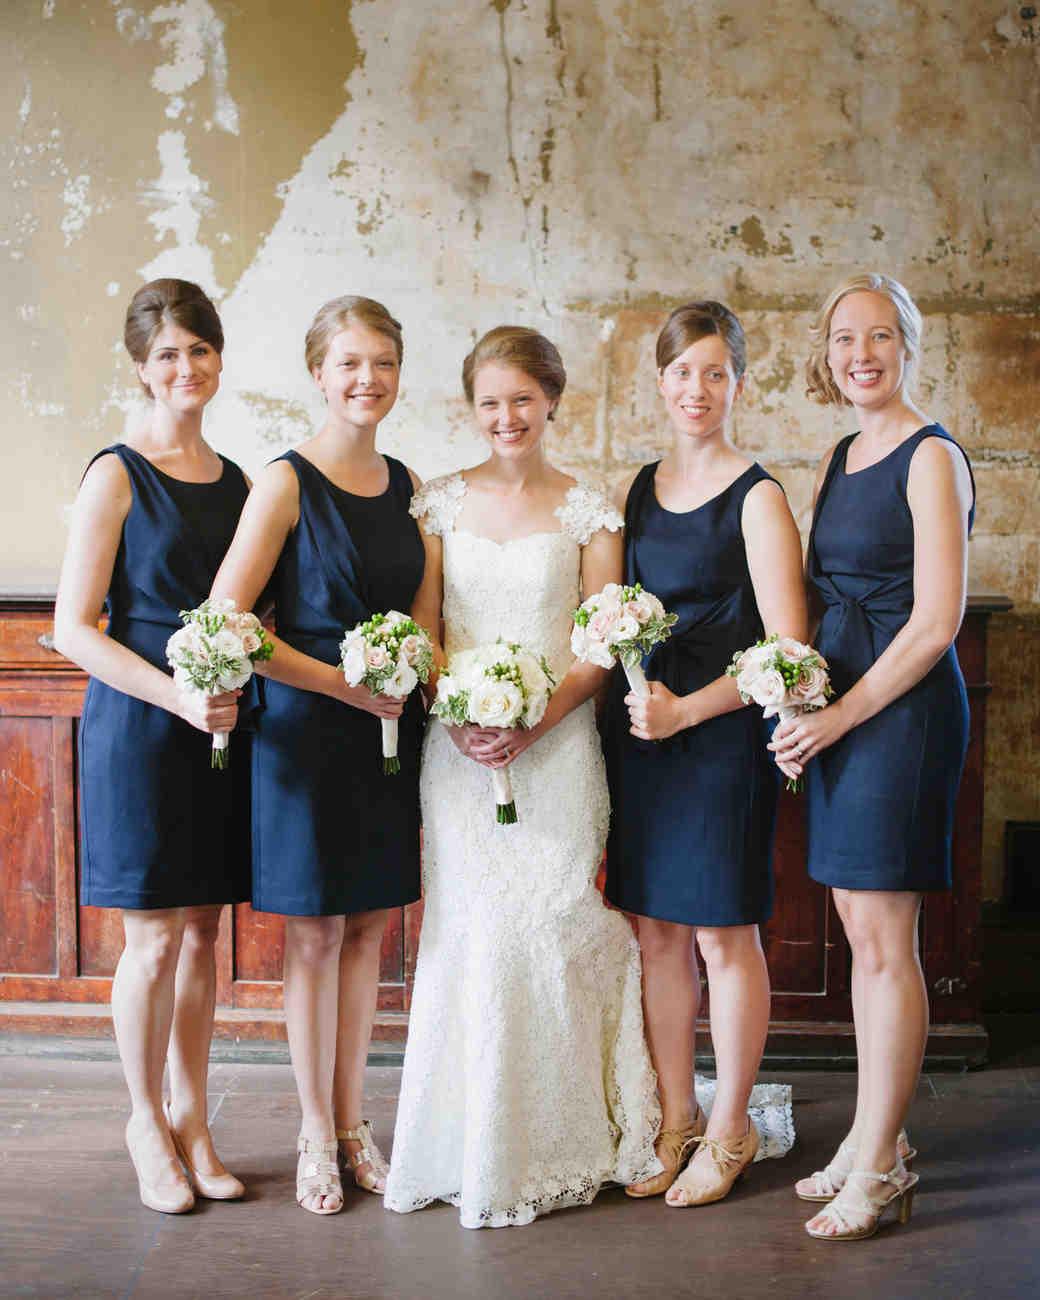 anna-don-wedding-bridesmaids-0714.jpg